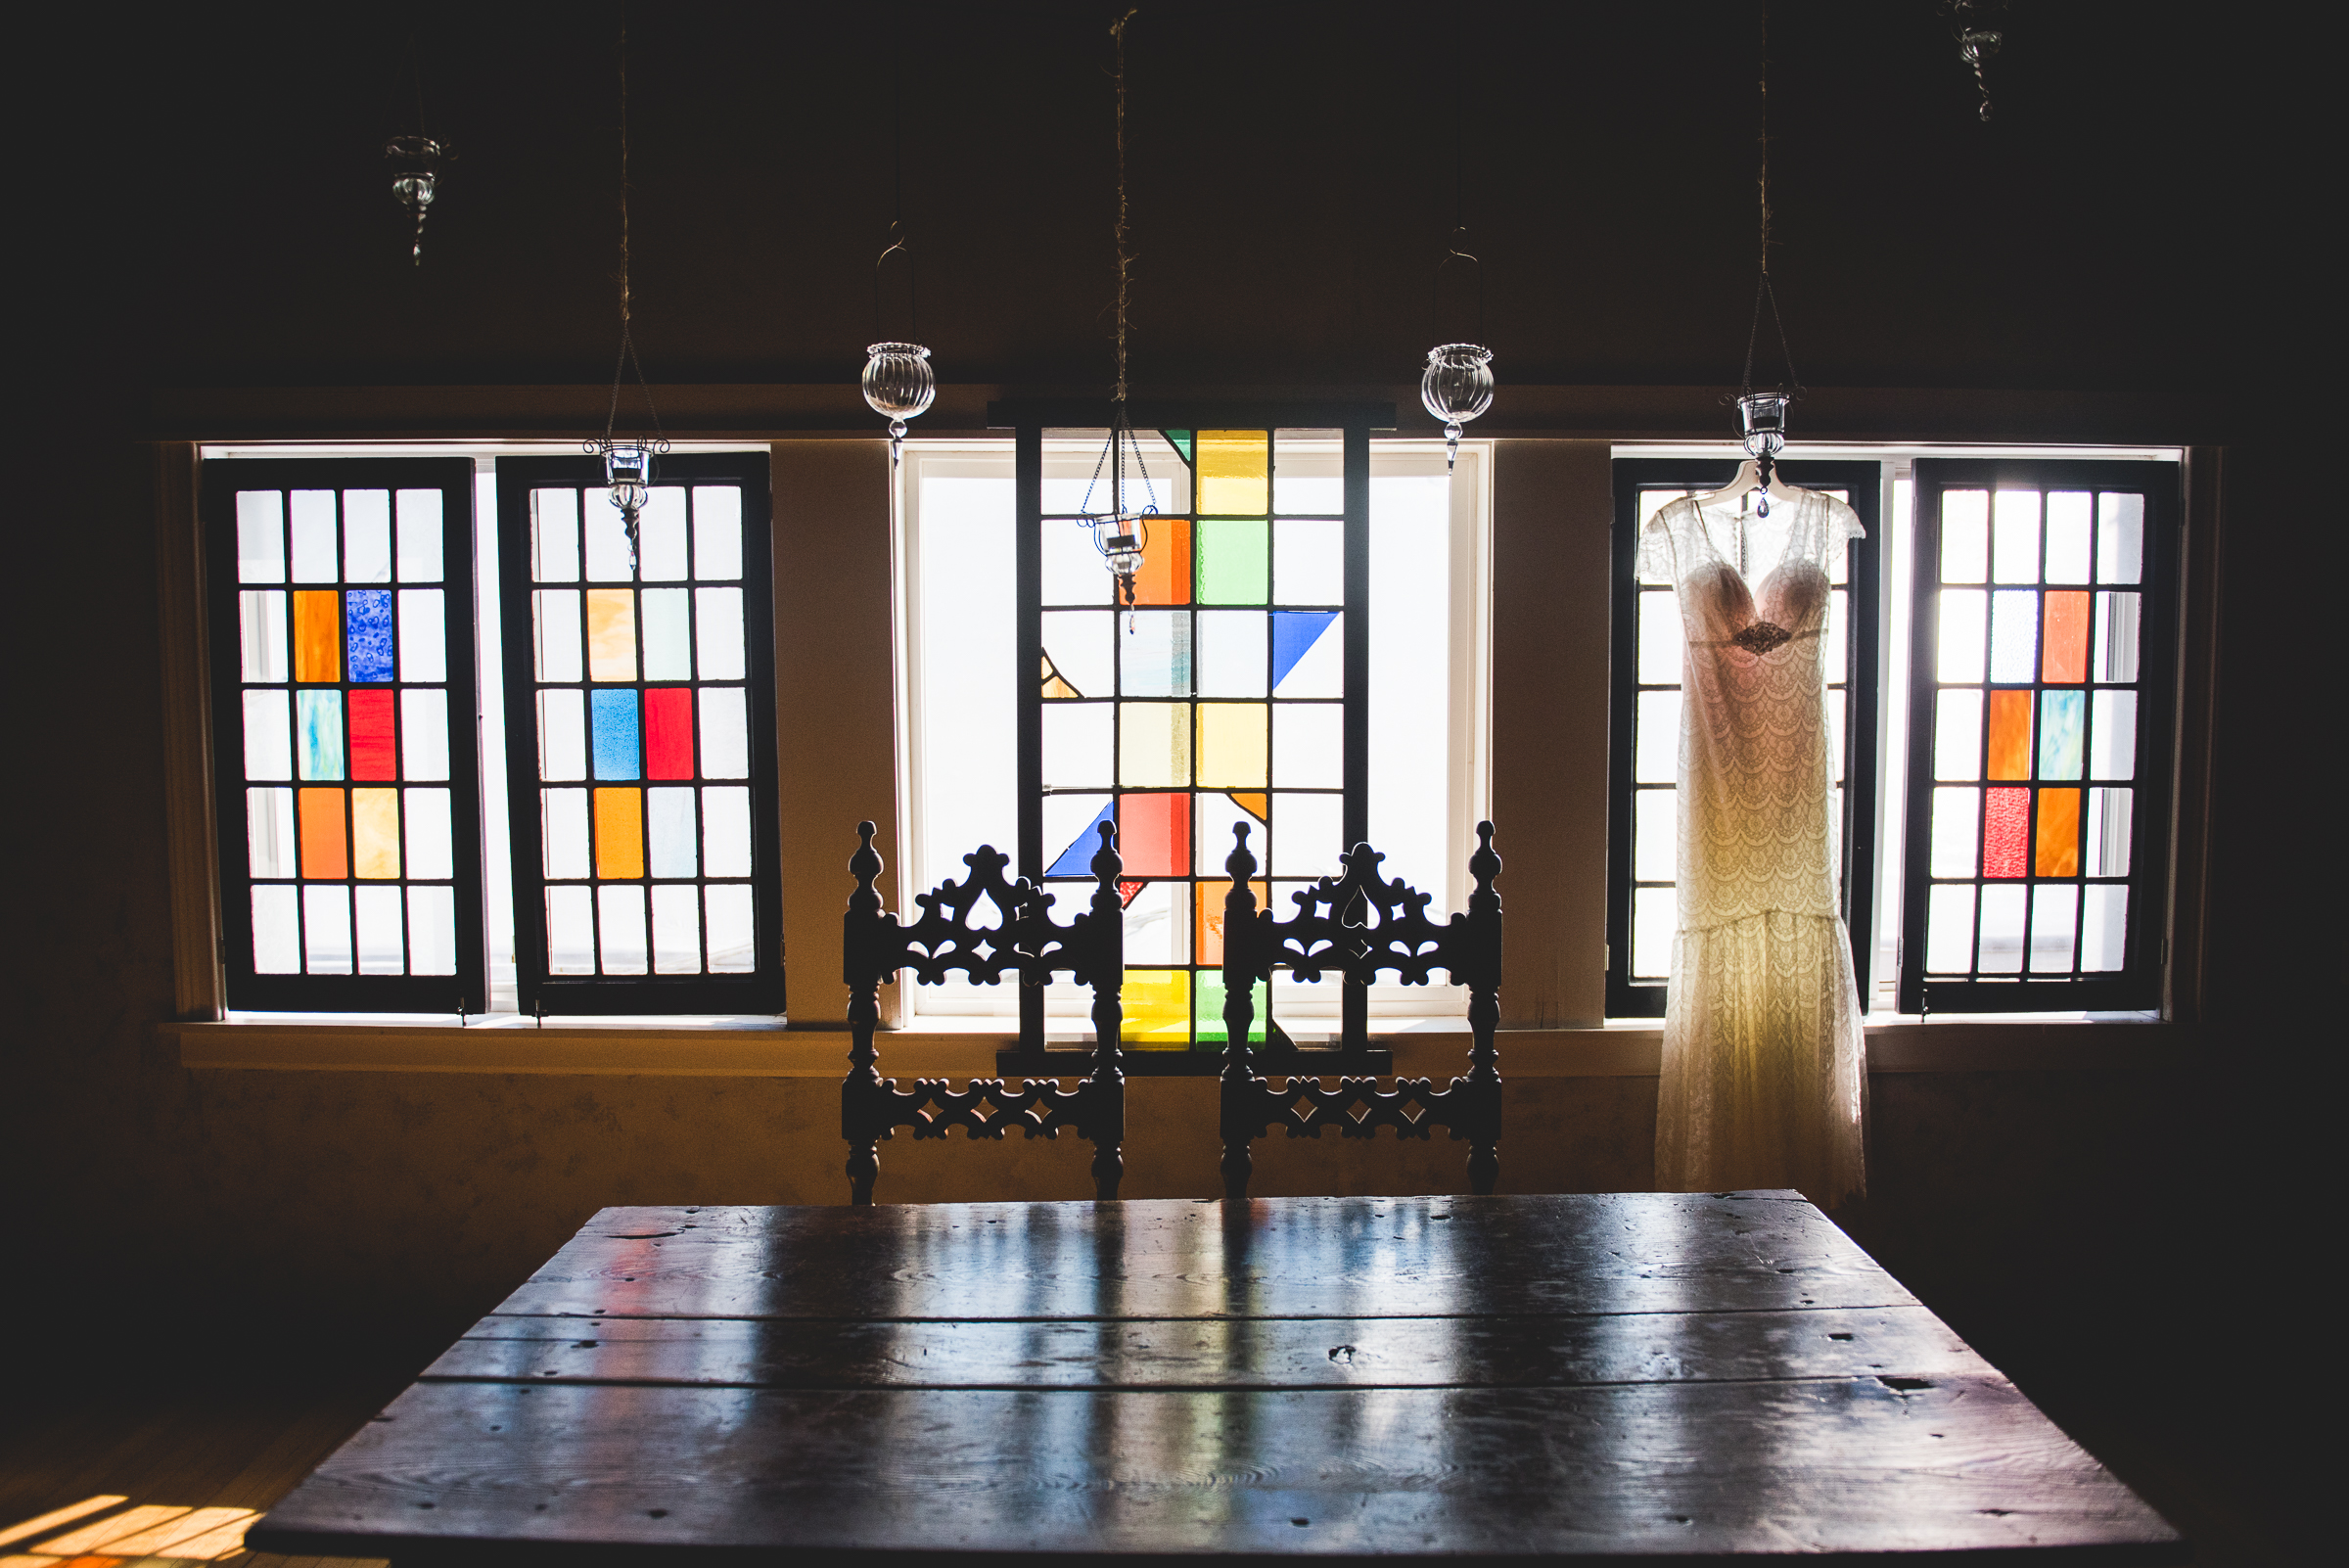 grandma's stained glass windows